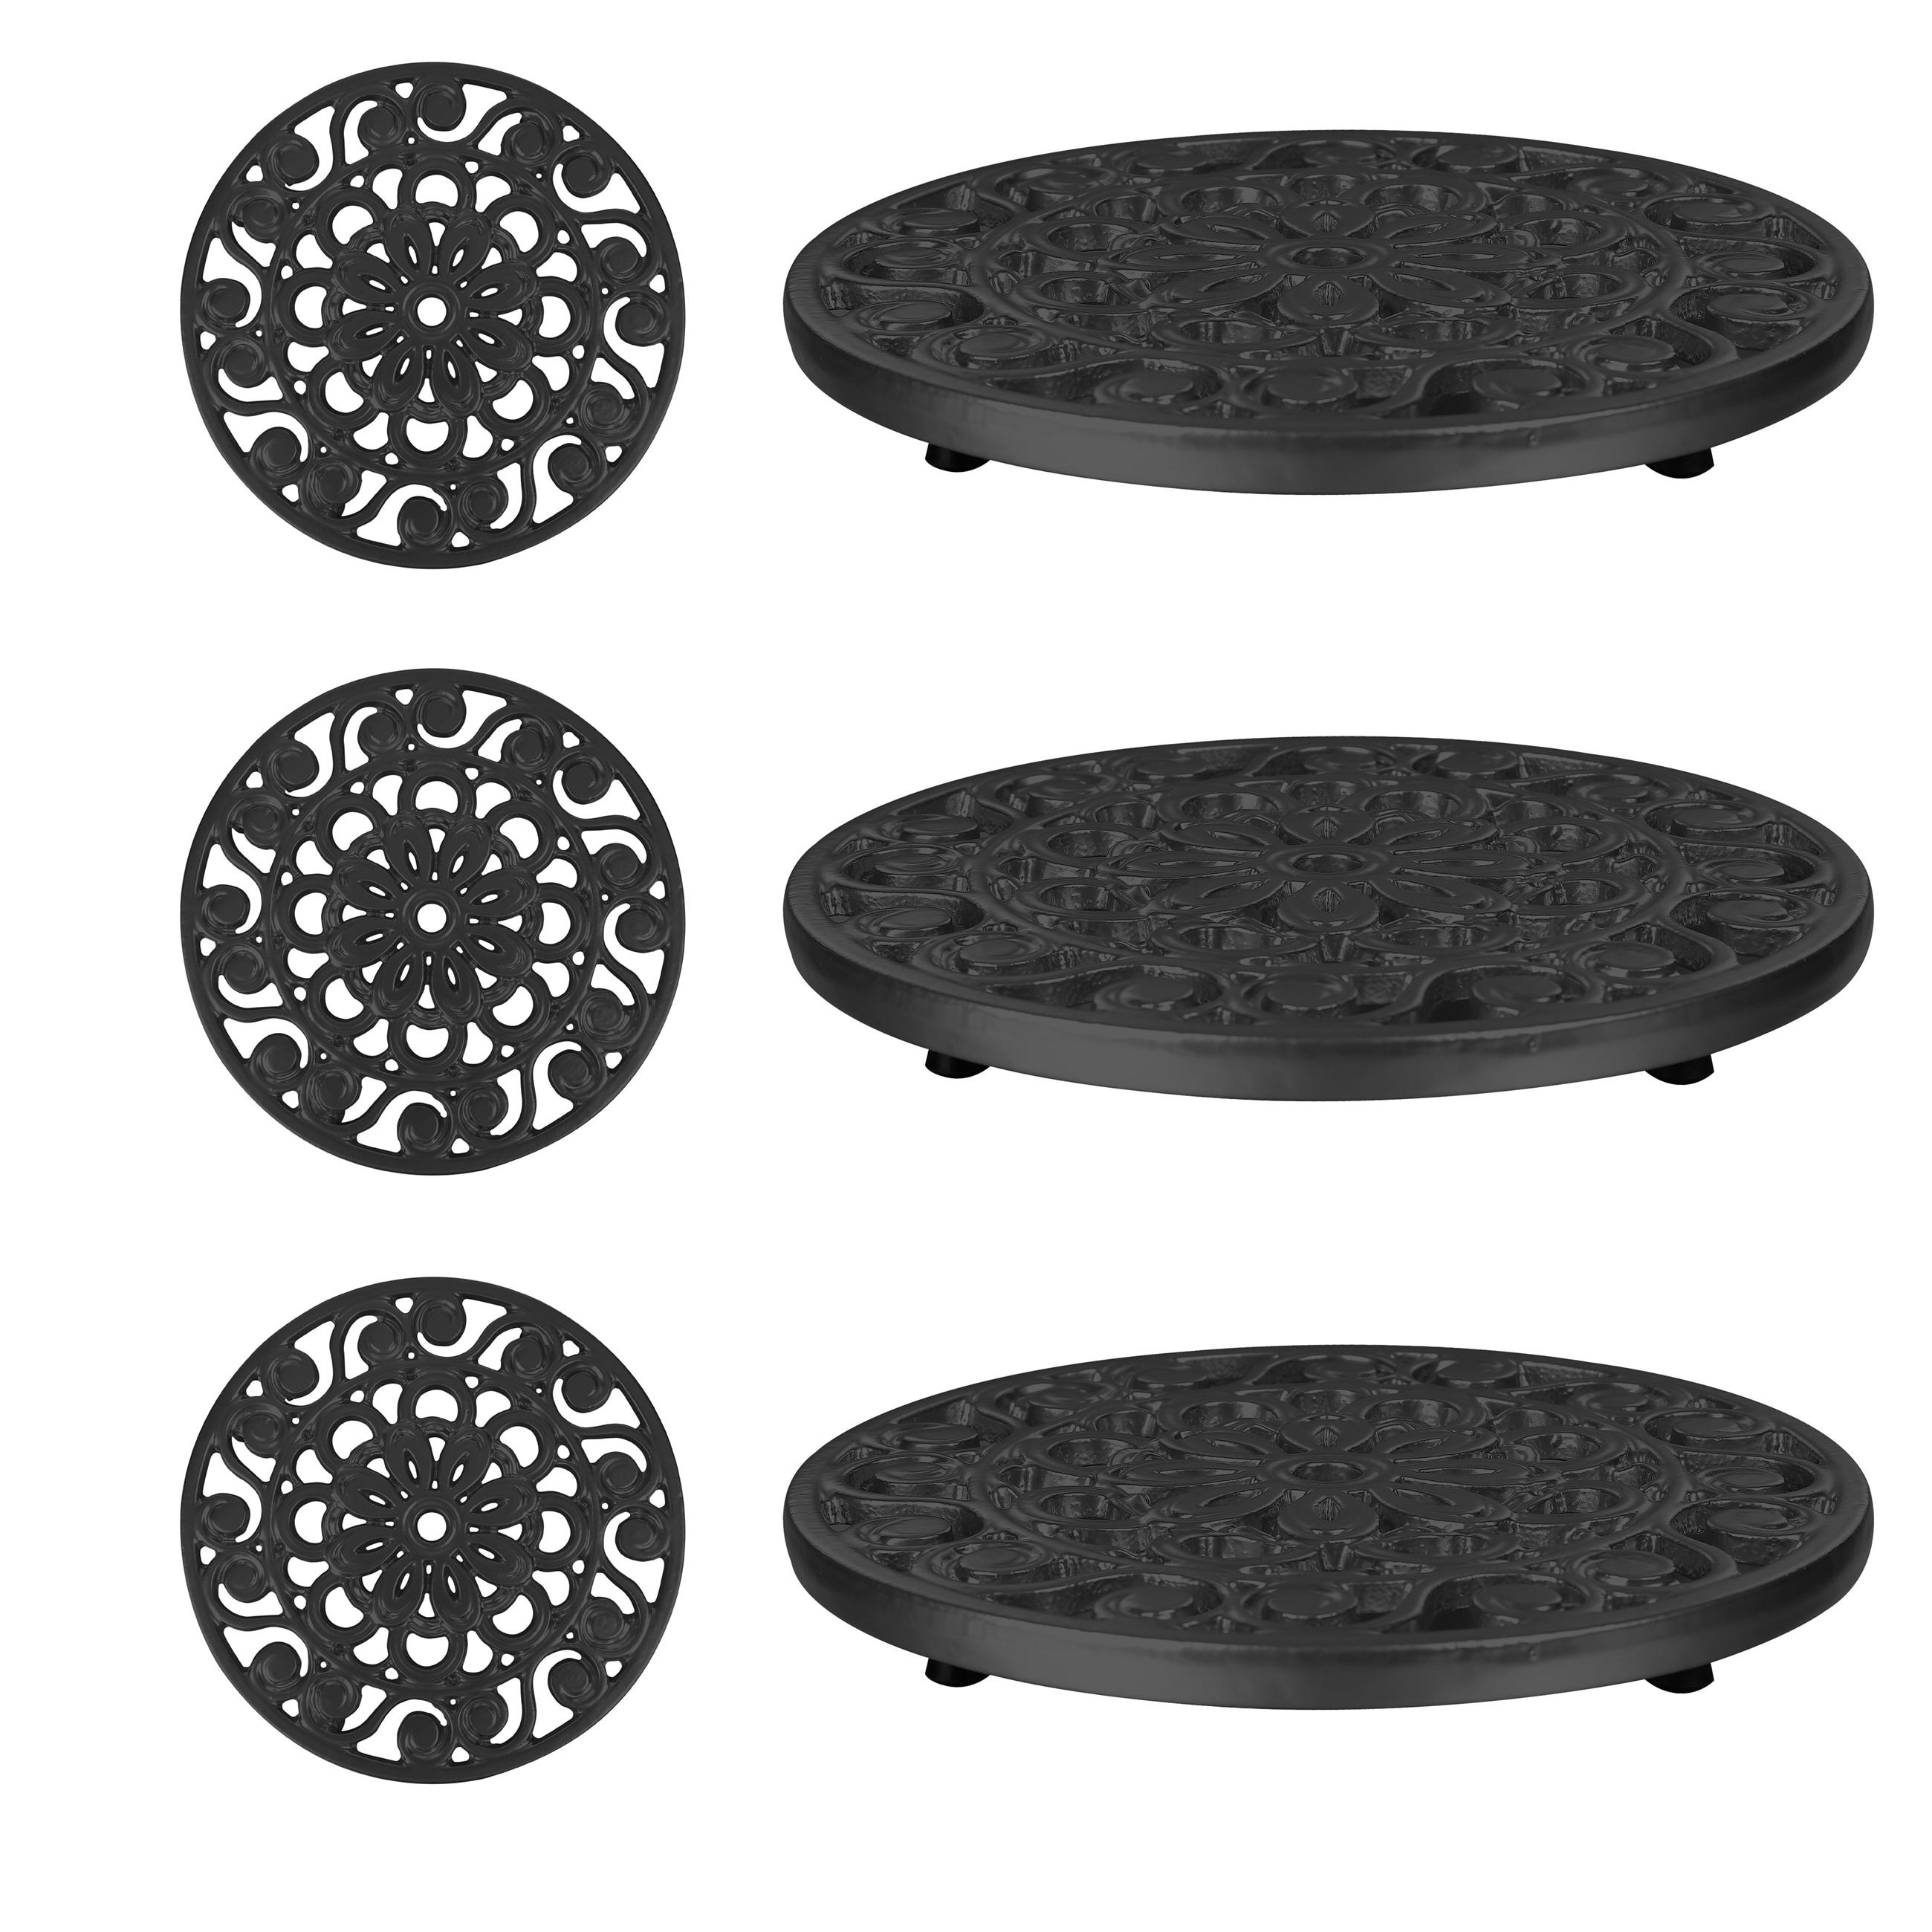 Trademark Innovations Decorative Black Cast Iron Metal Trivets Set Of 3 Overstock 13741534